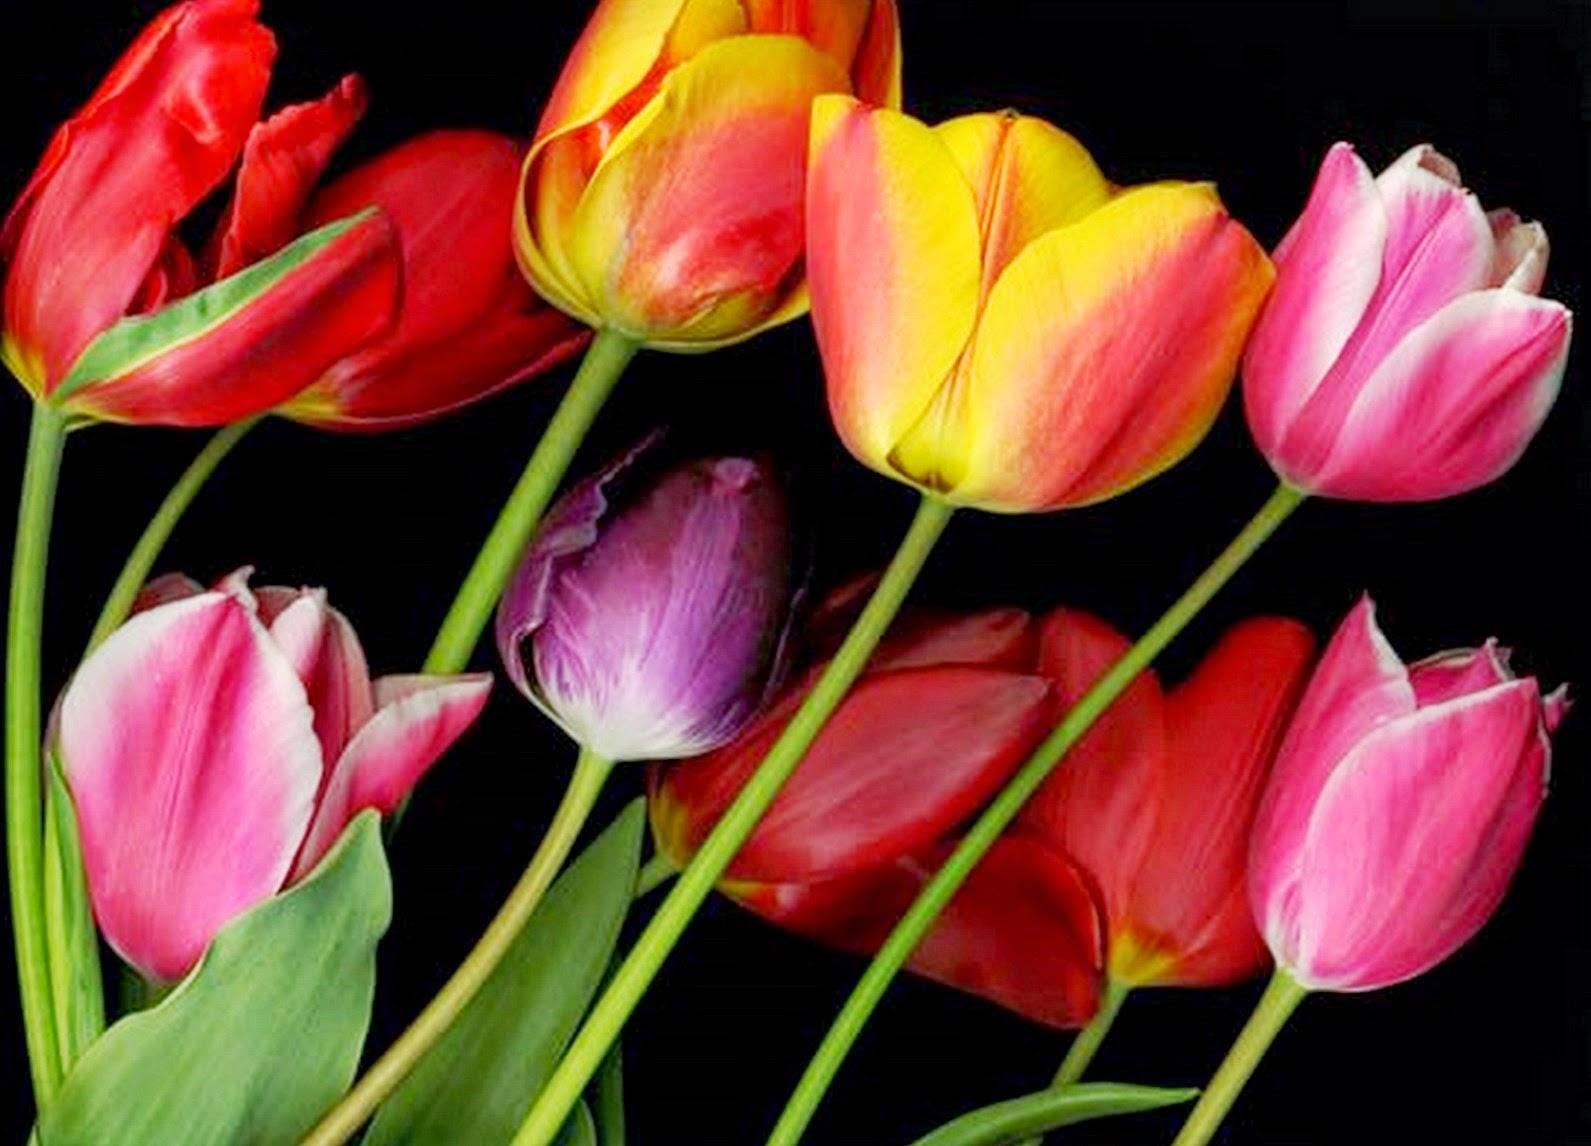 flores-fotos-imagenes